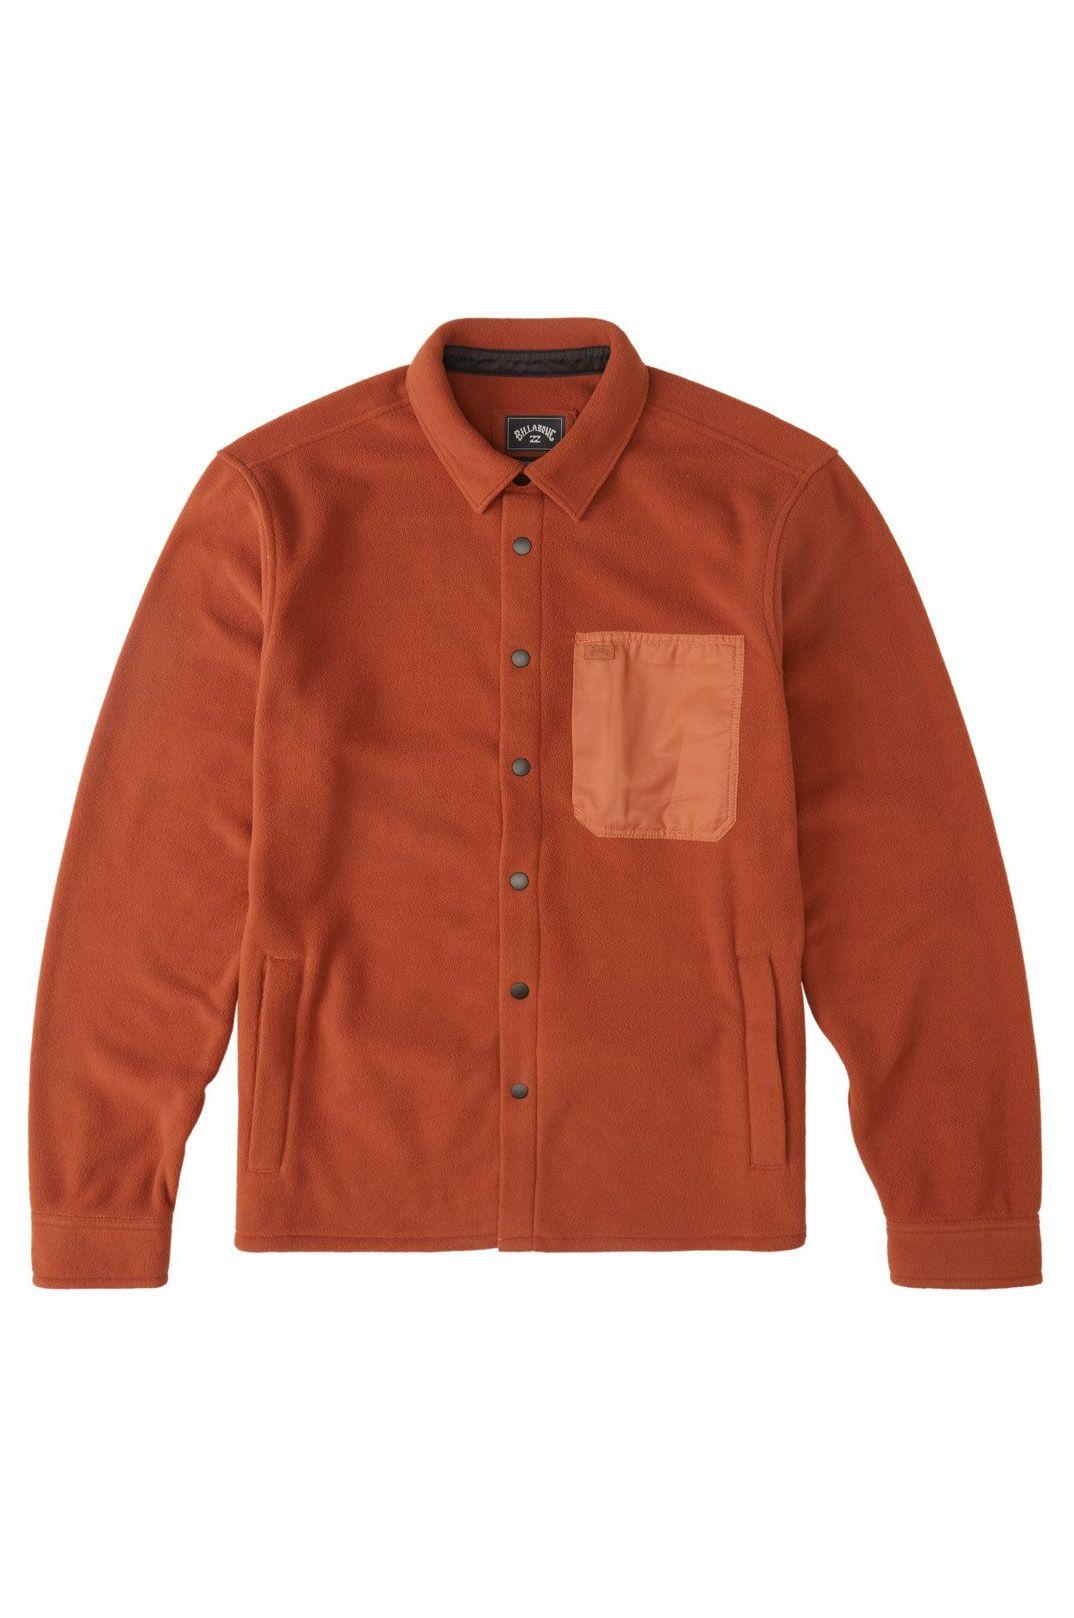 Billabong Shirt FURNACE EXPLORER ADVENTURE DIVISION Amber